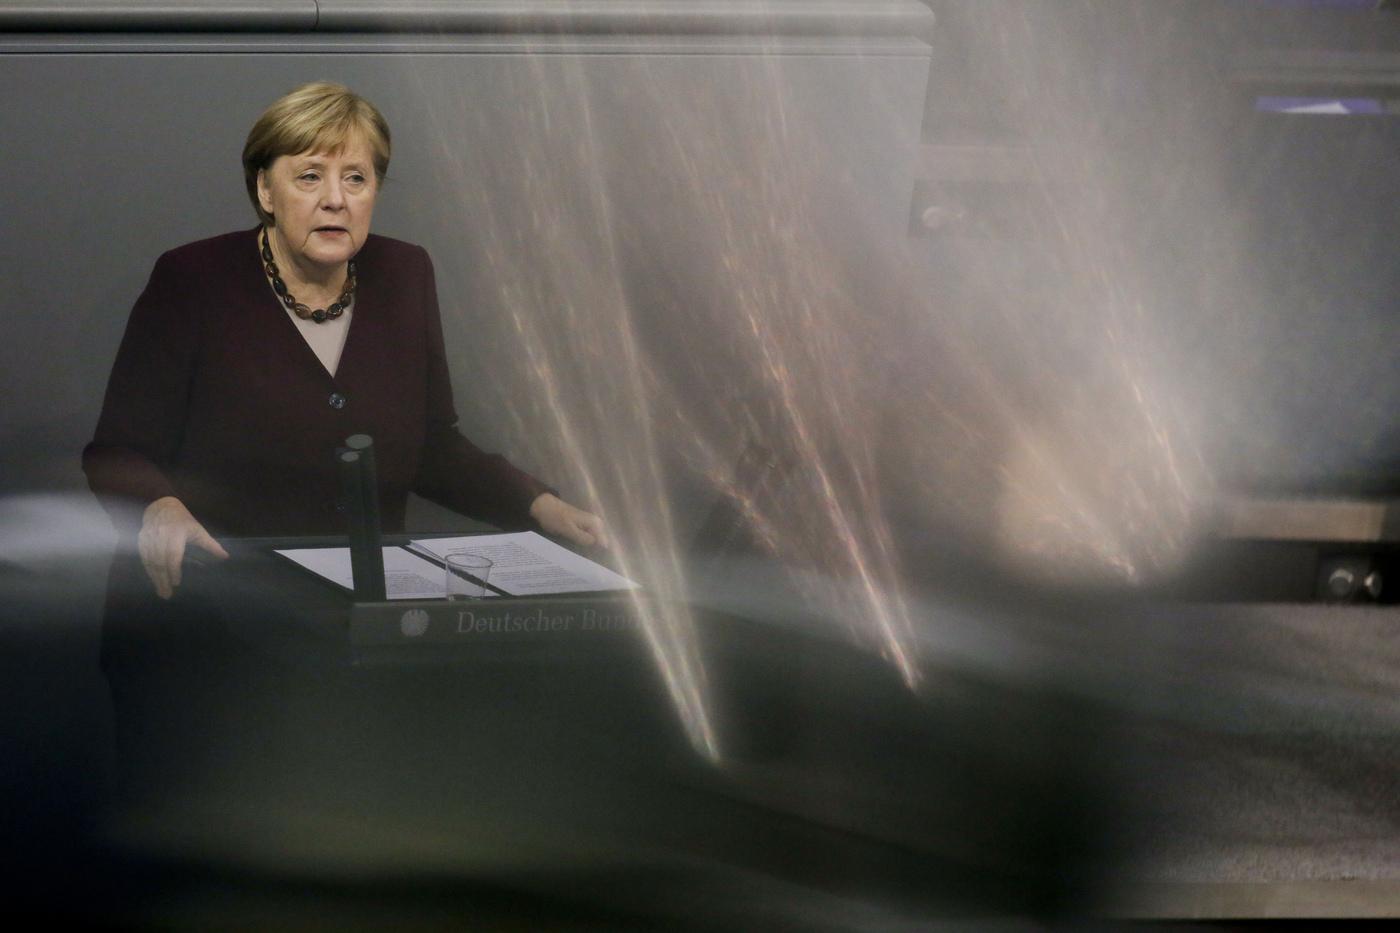 La Merkel non salva il Natale